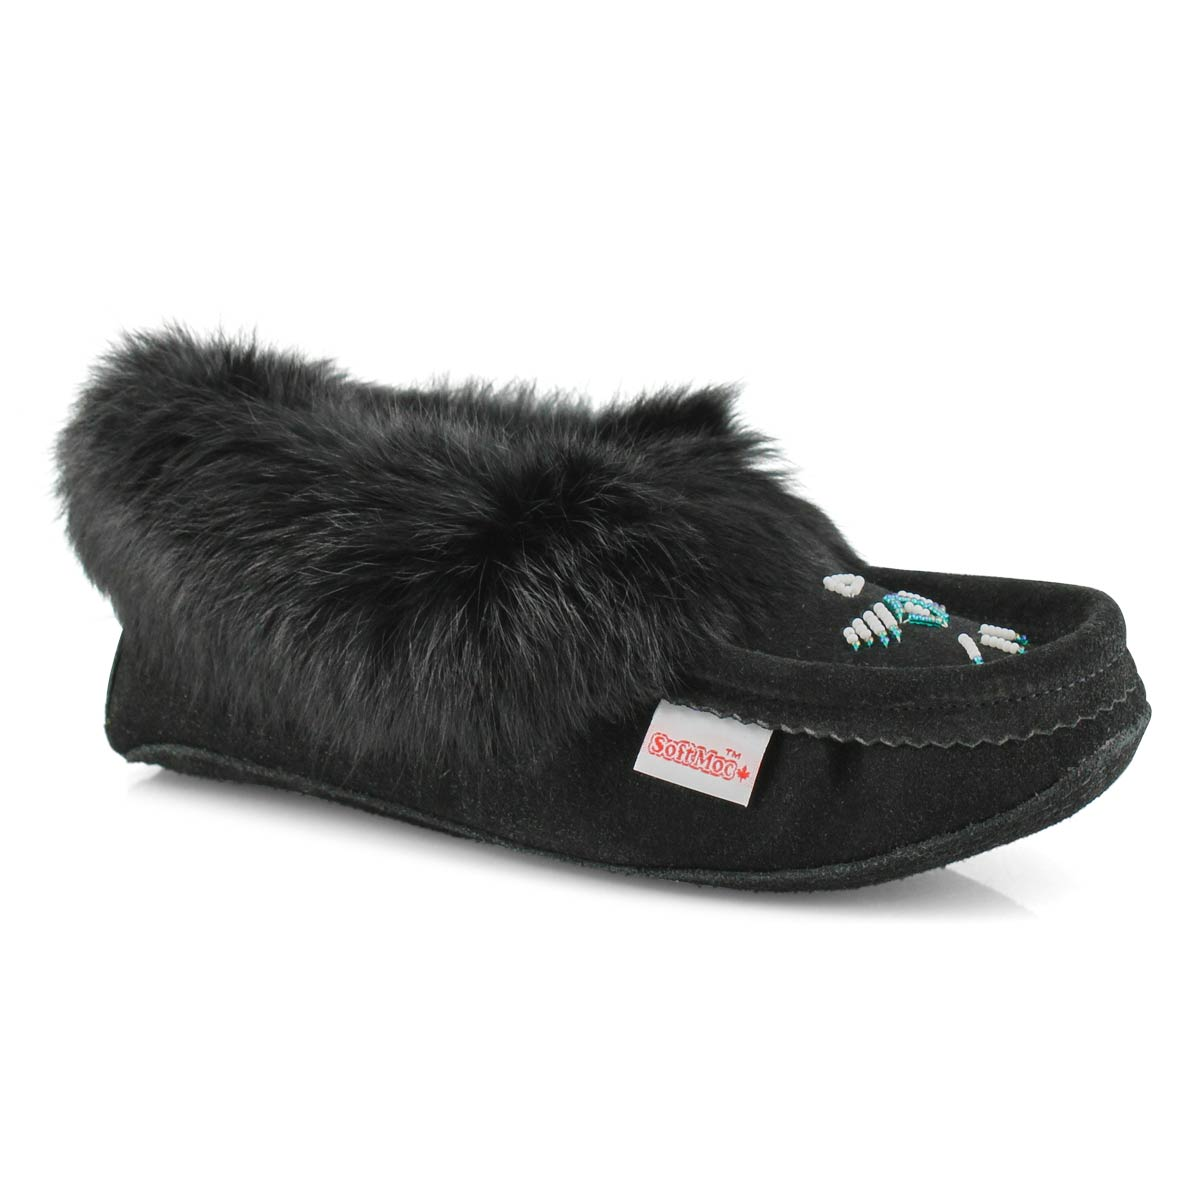 Lds black rabbit fur moccasin